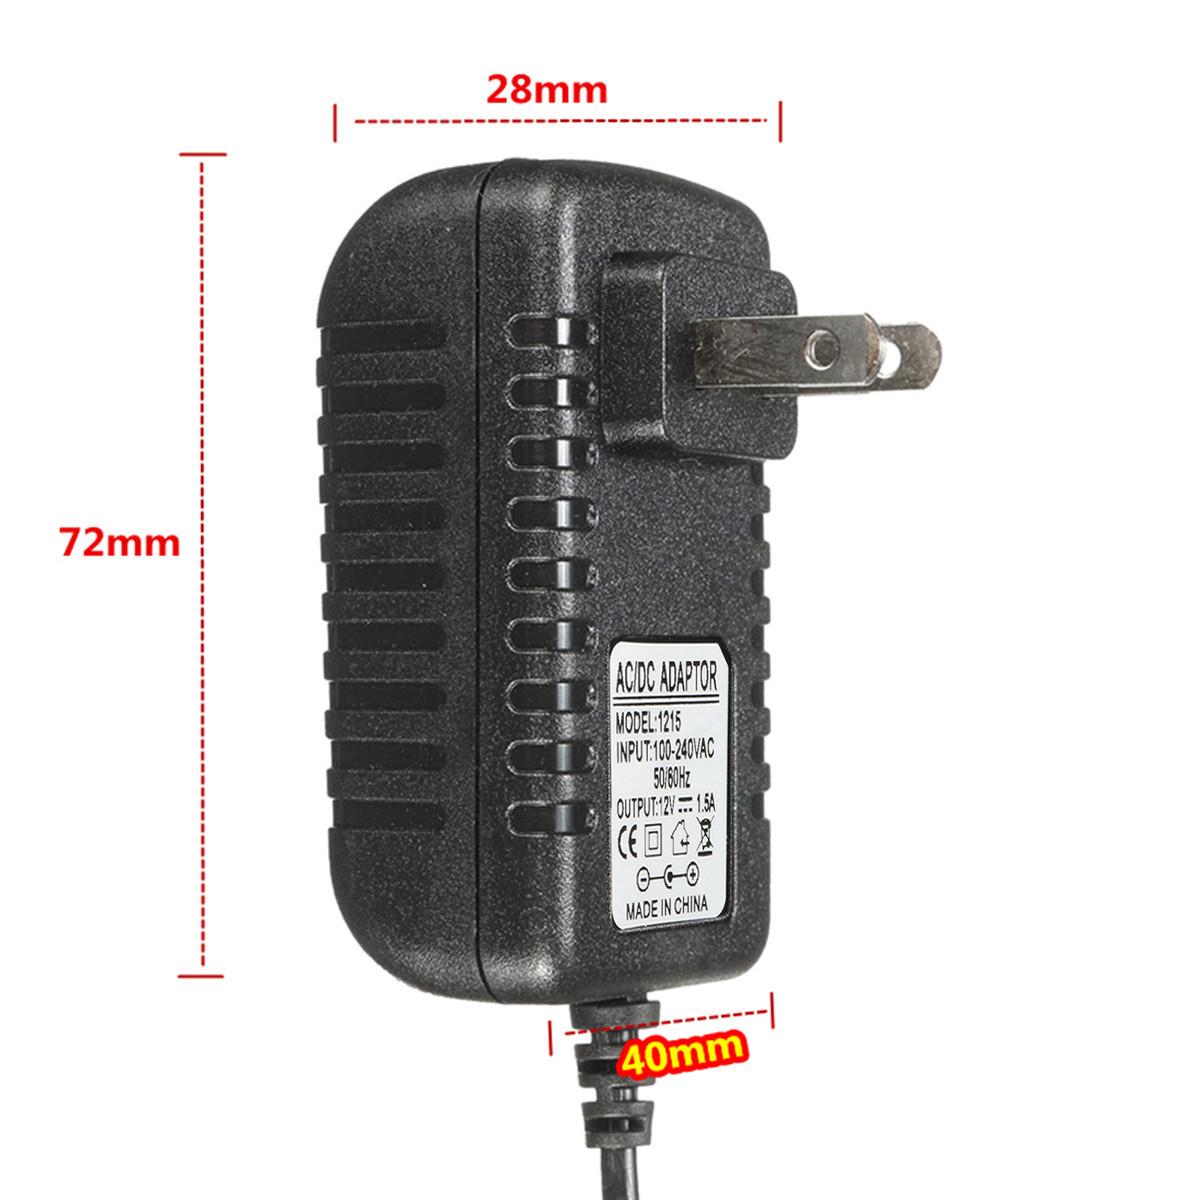 AC 100-240V TO DC 12V Adapter Power Supply Transformer US Plug For LED Strip Light